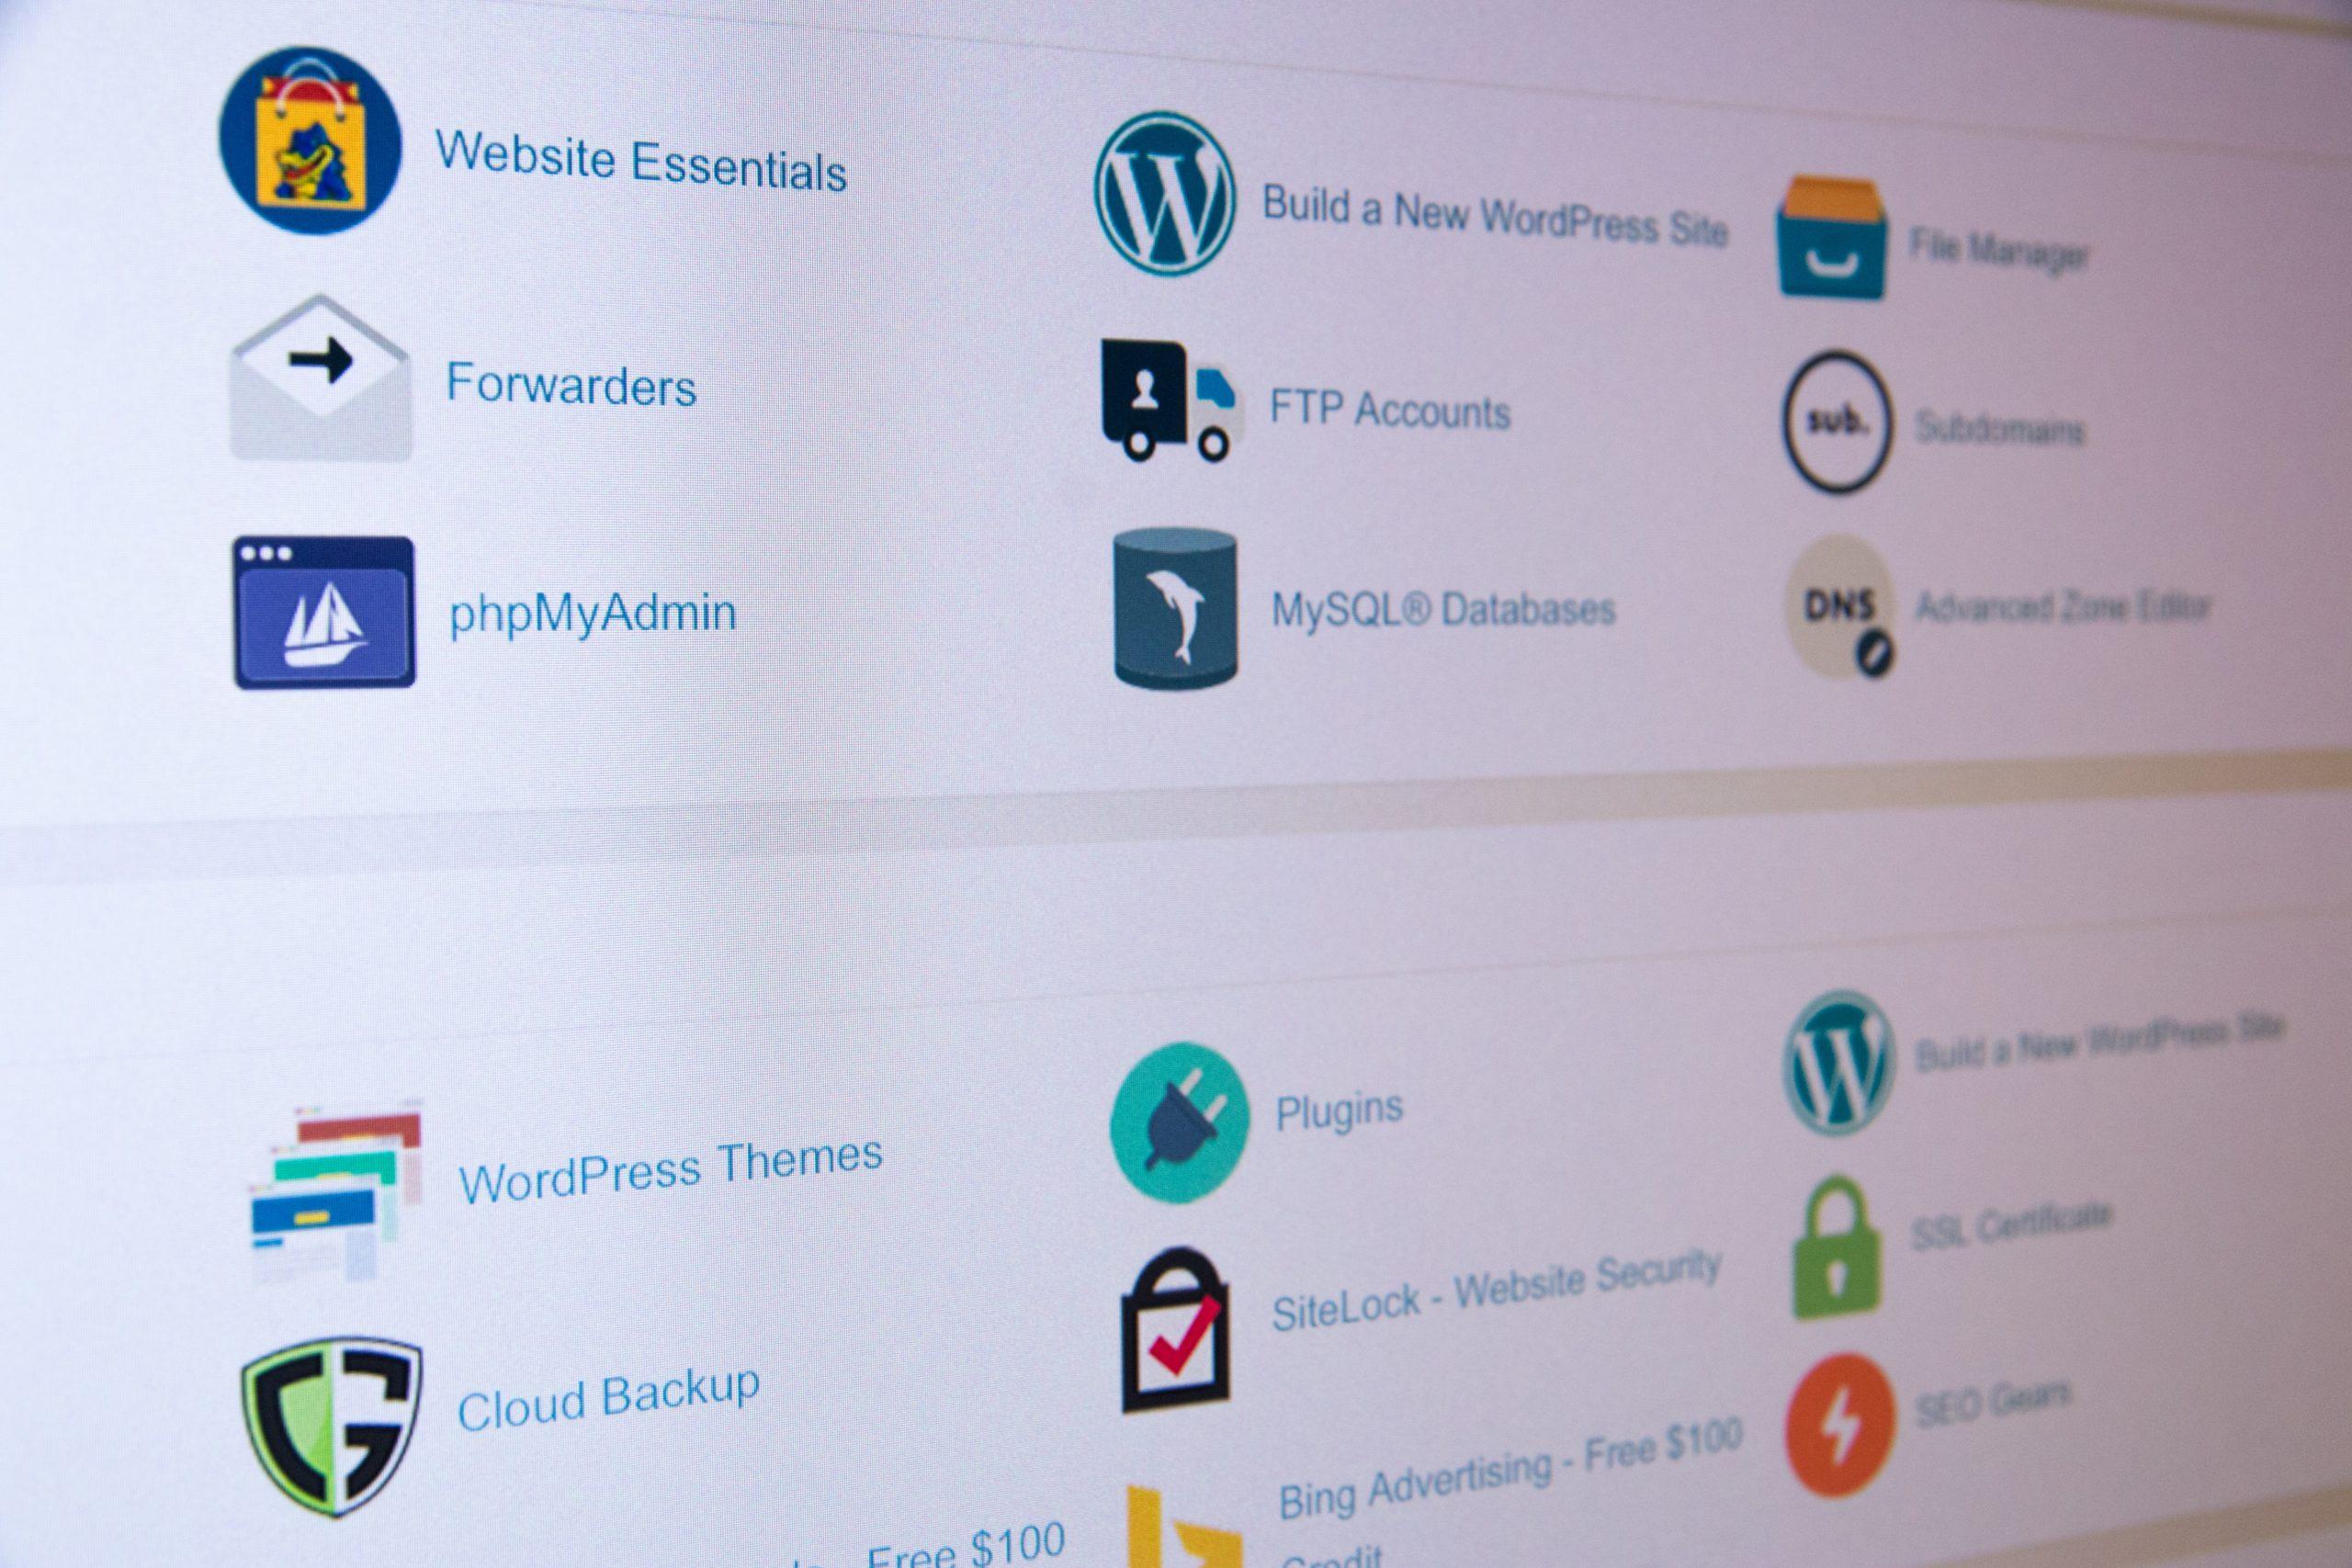 The Advanced Guide to Web Design